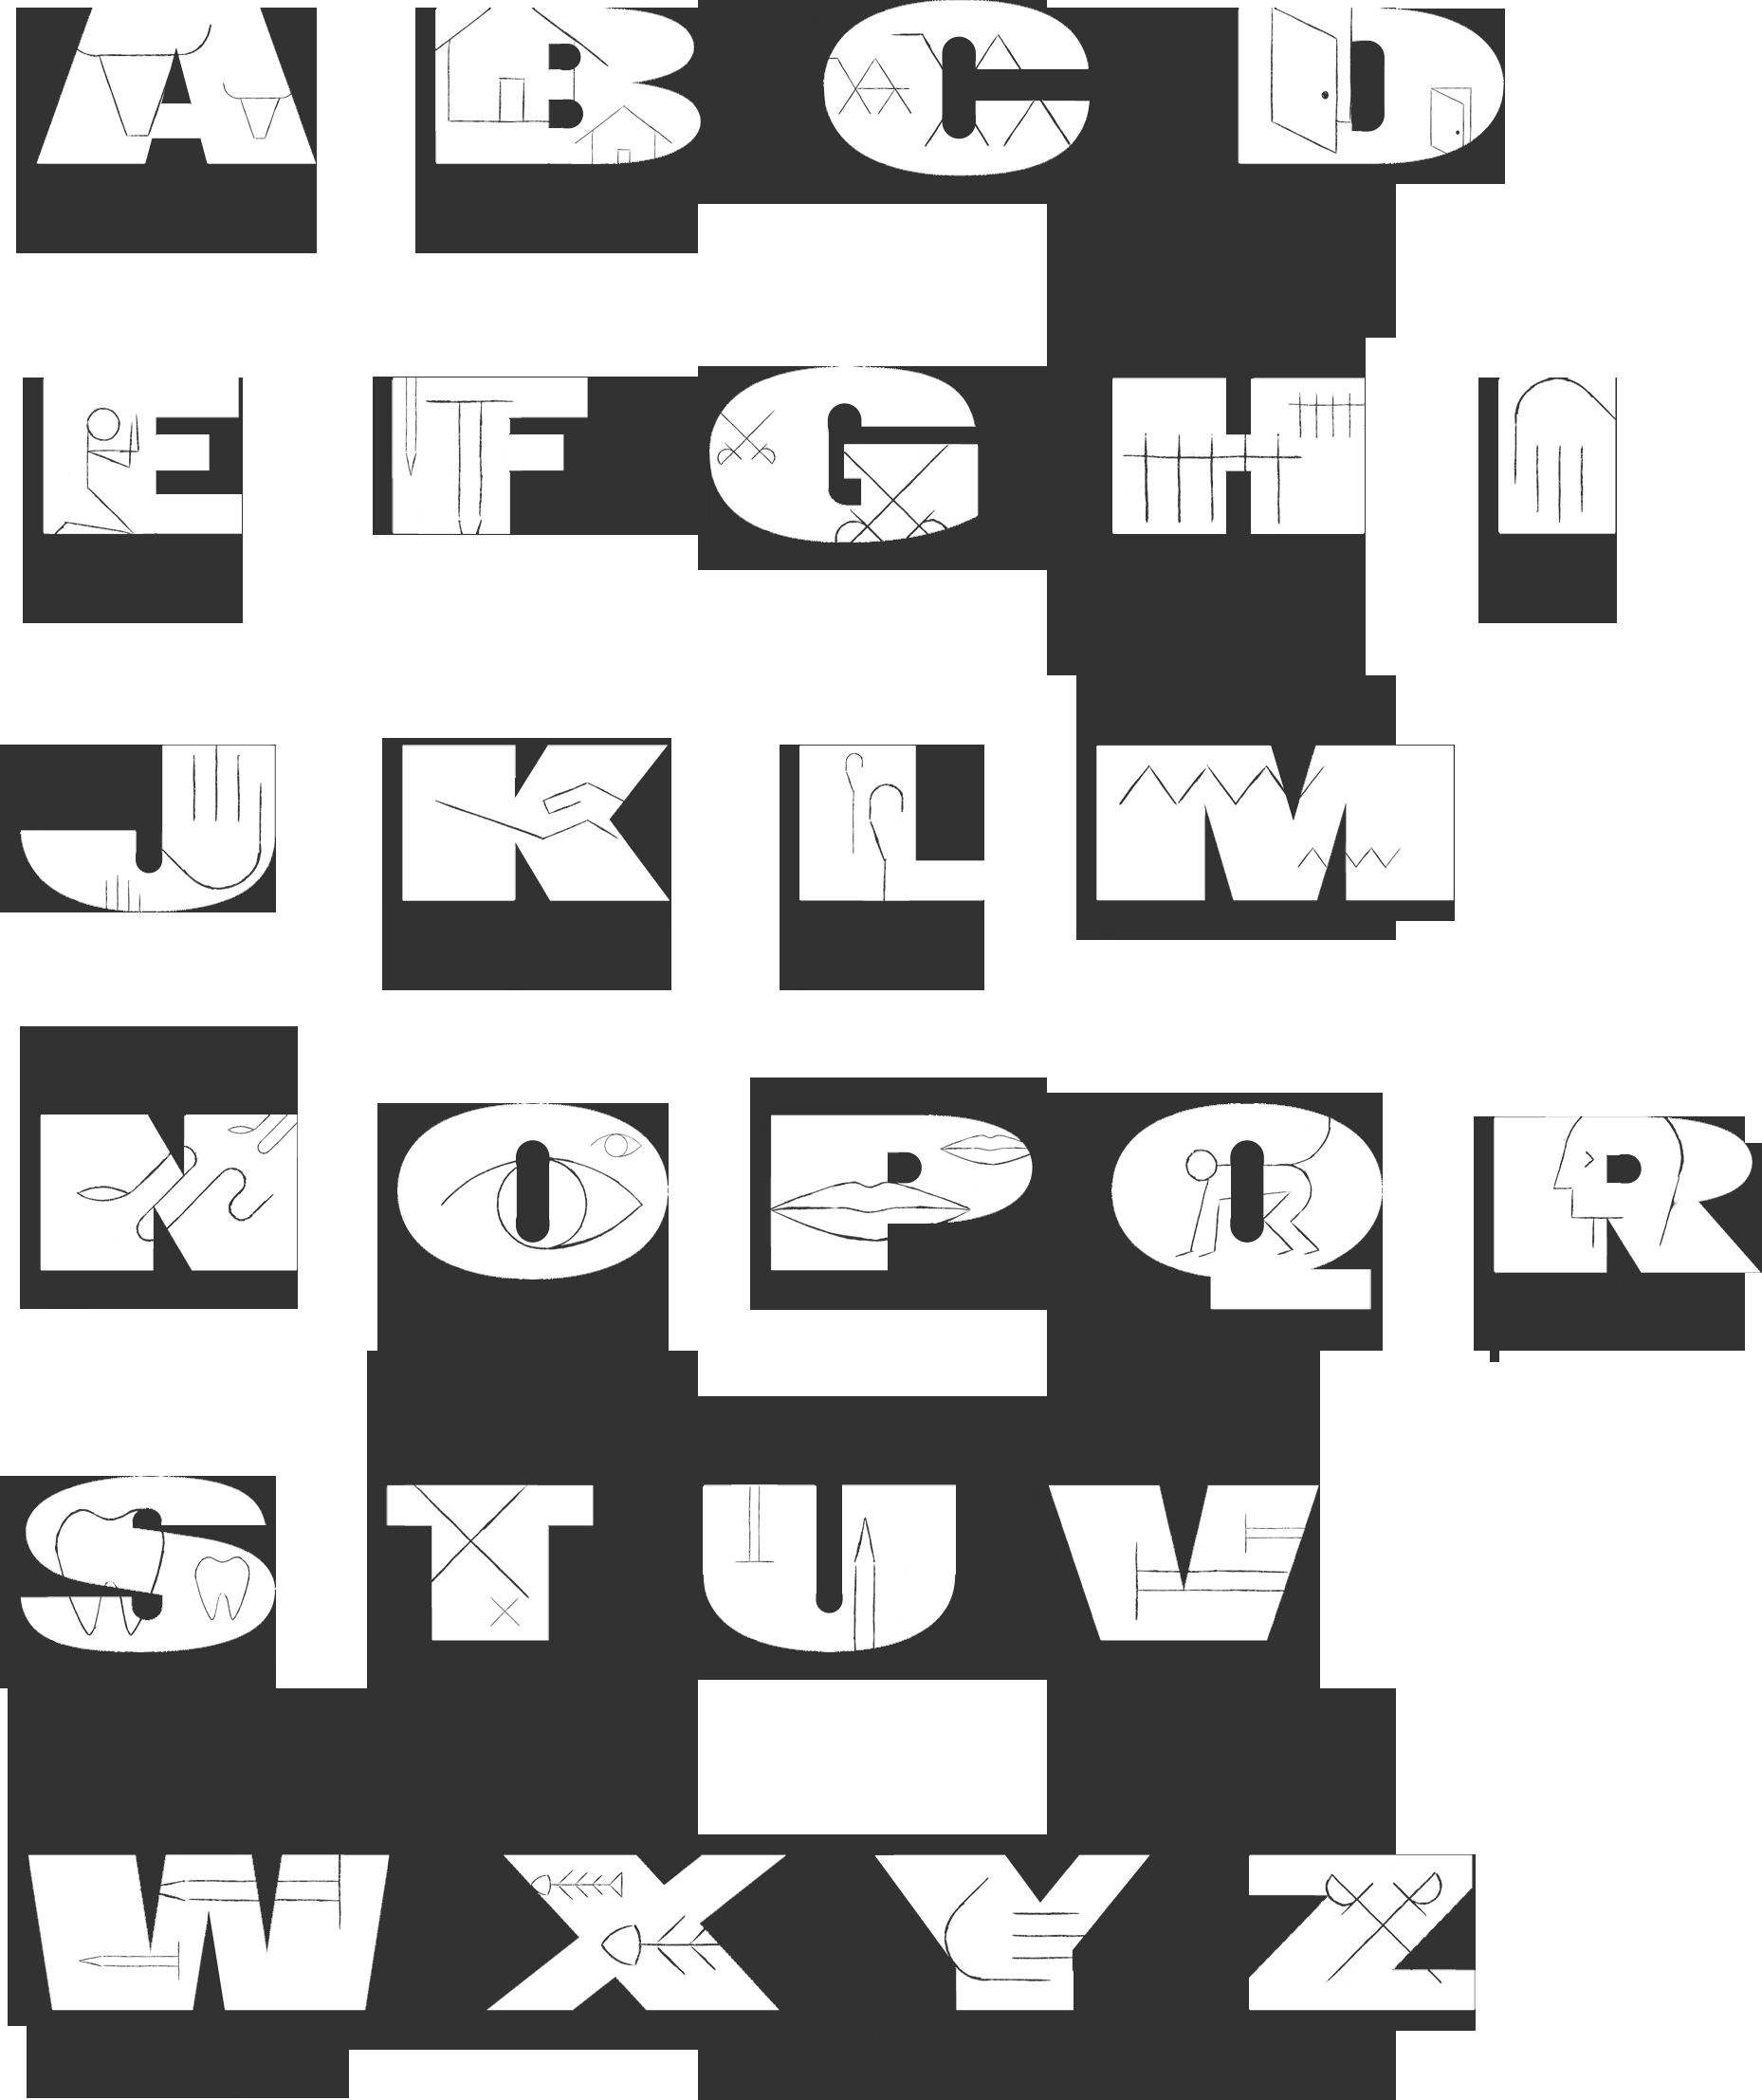 spertus-letters_adj3.png